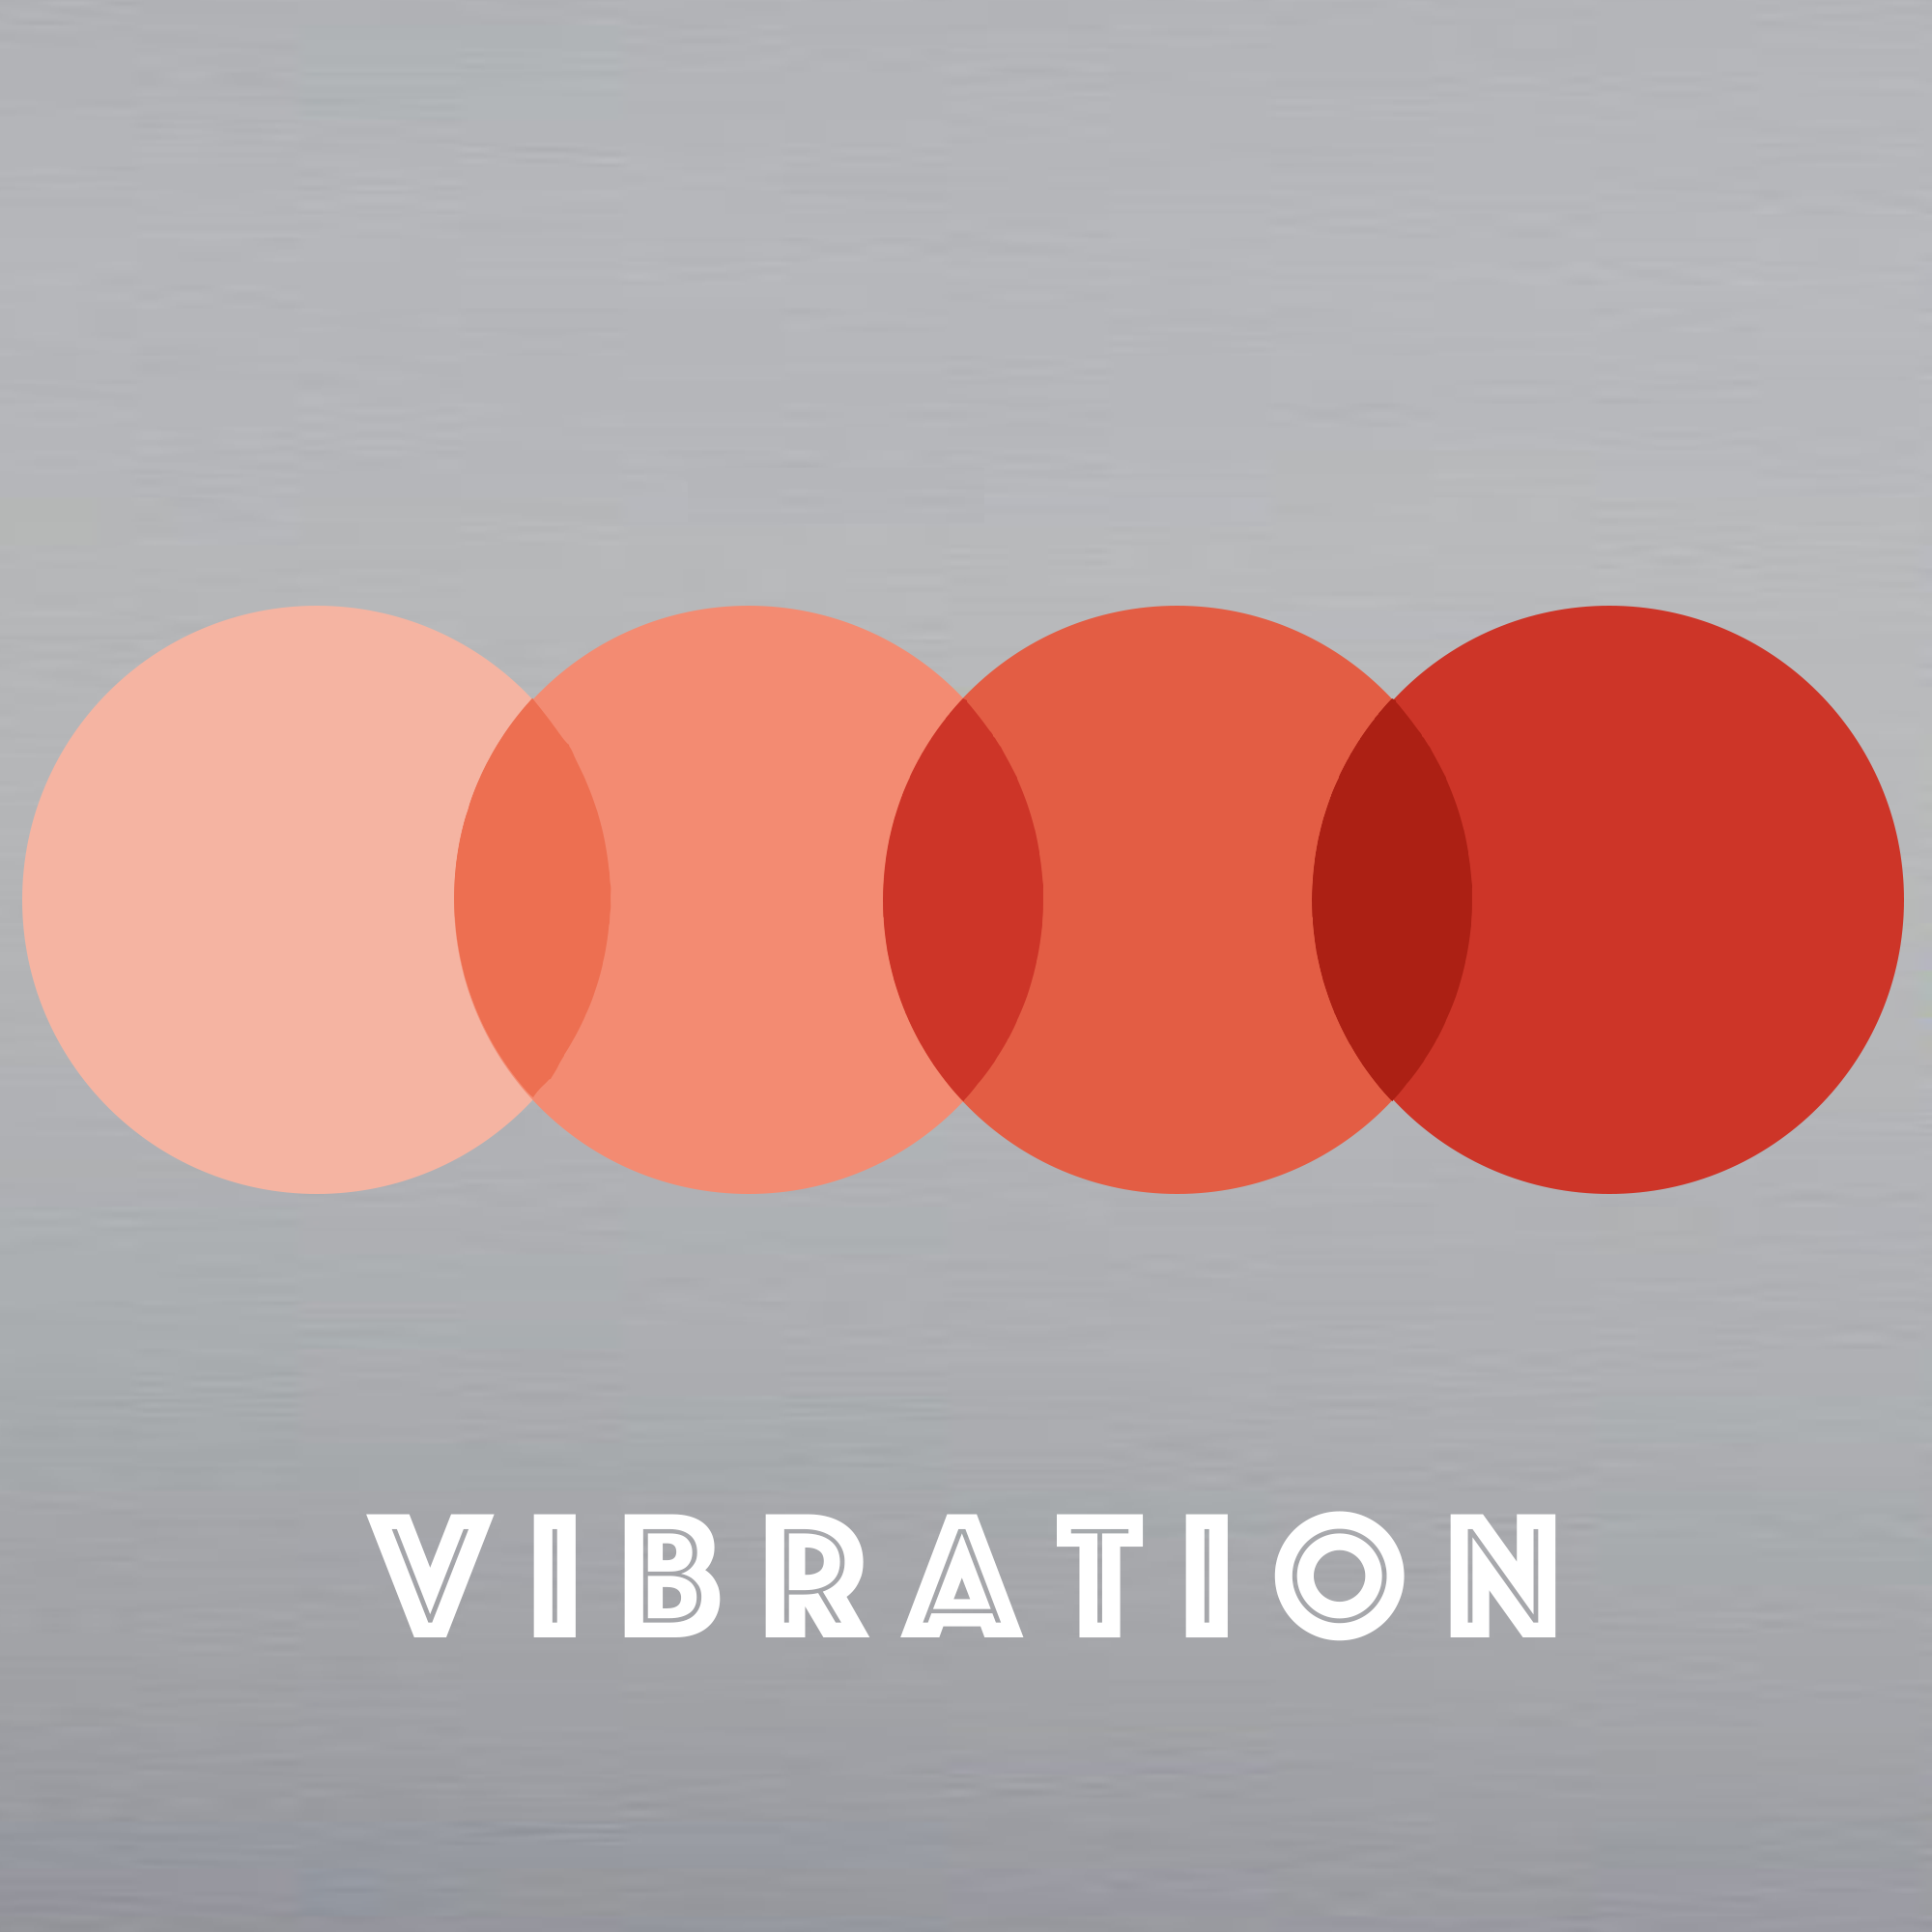 Vibration 歪波音室 Logo